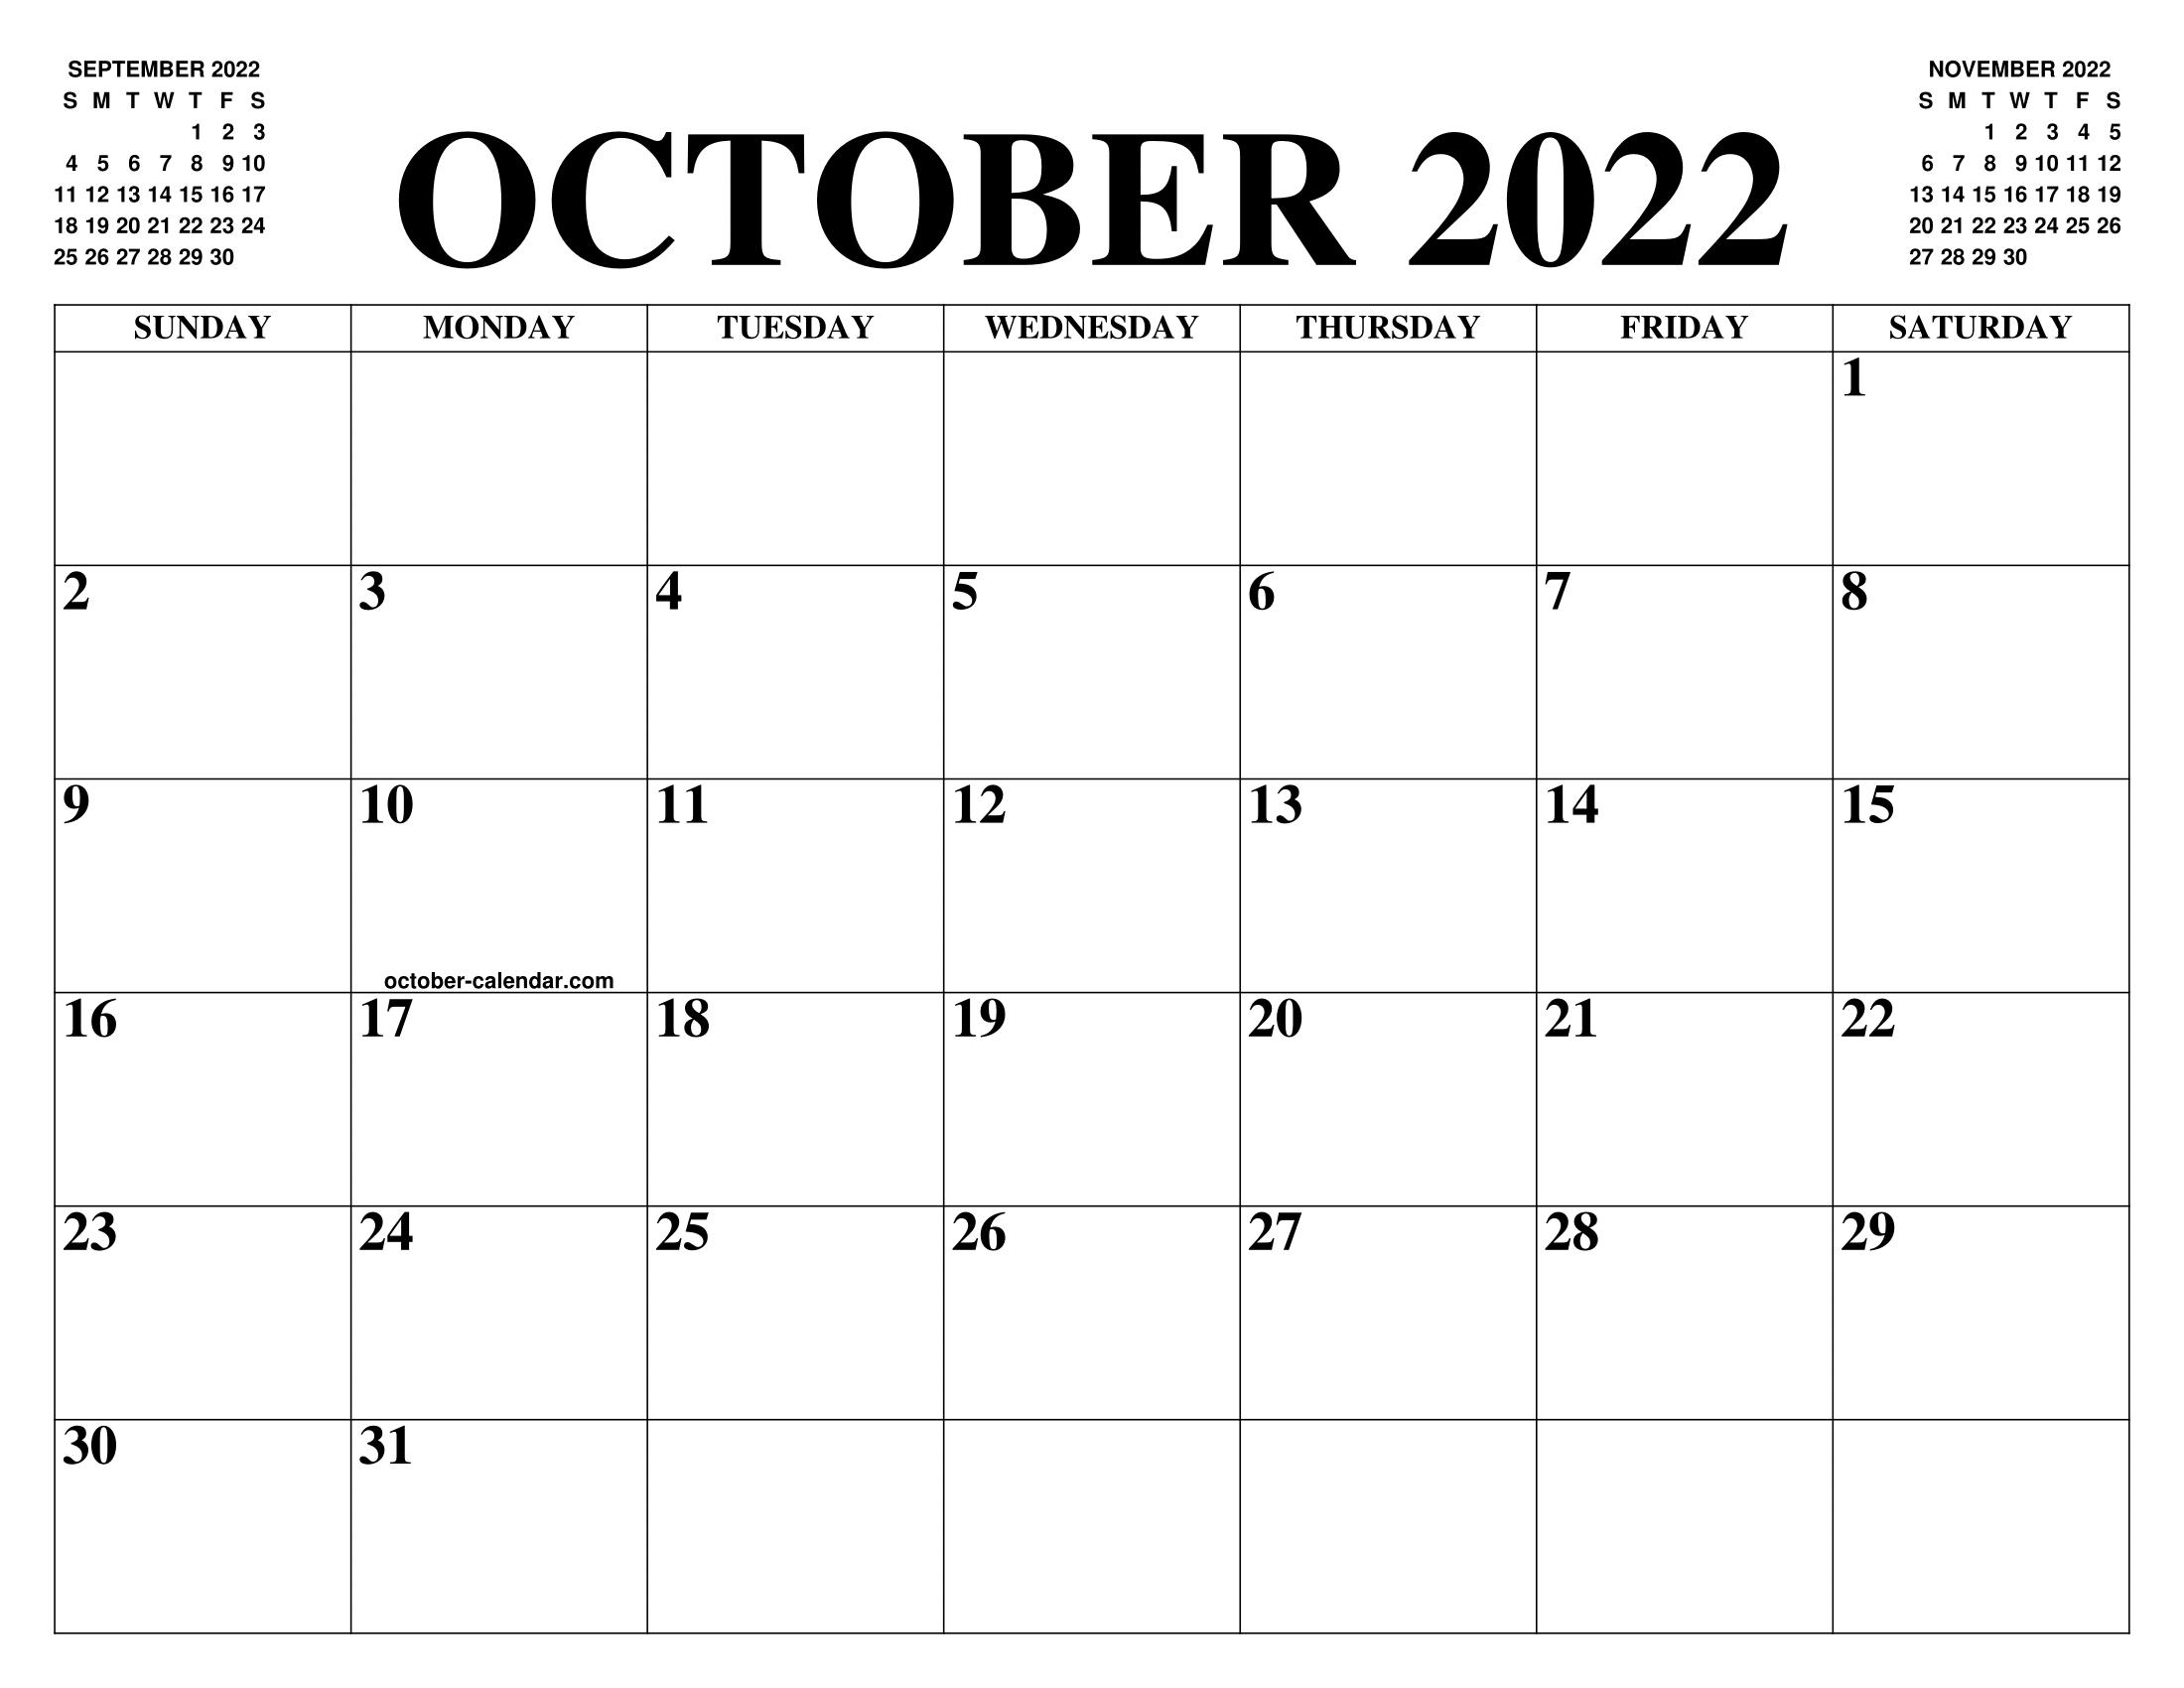 Free Printable Calendar October 2022.October 2022 Calendar Of The Month Free Printable October Calendar Of The Year Agenda